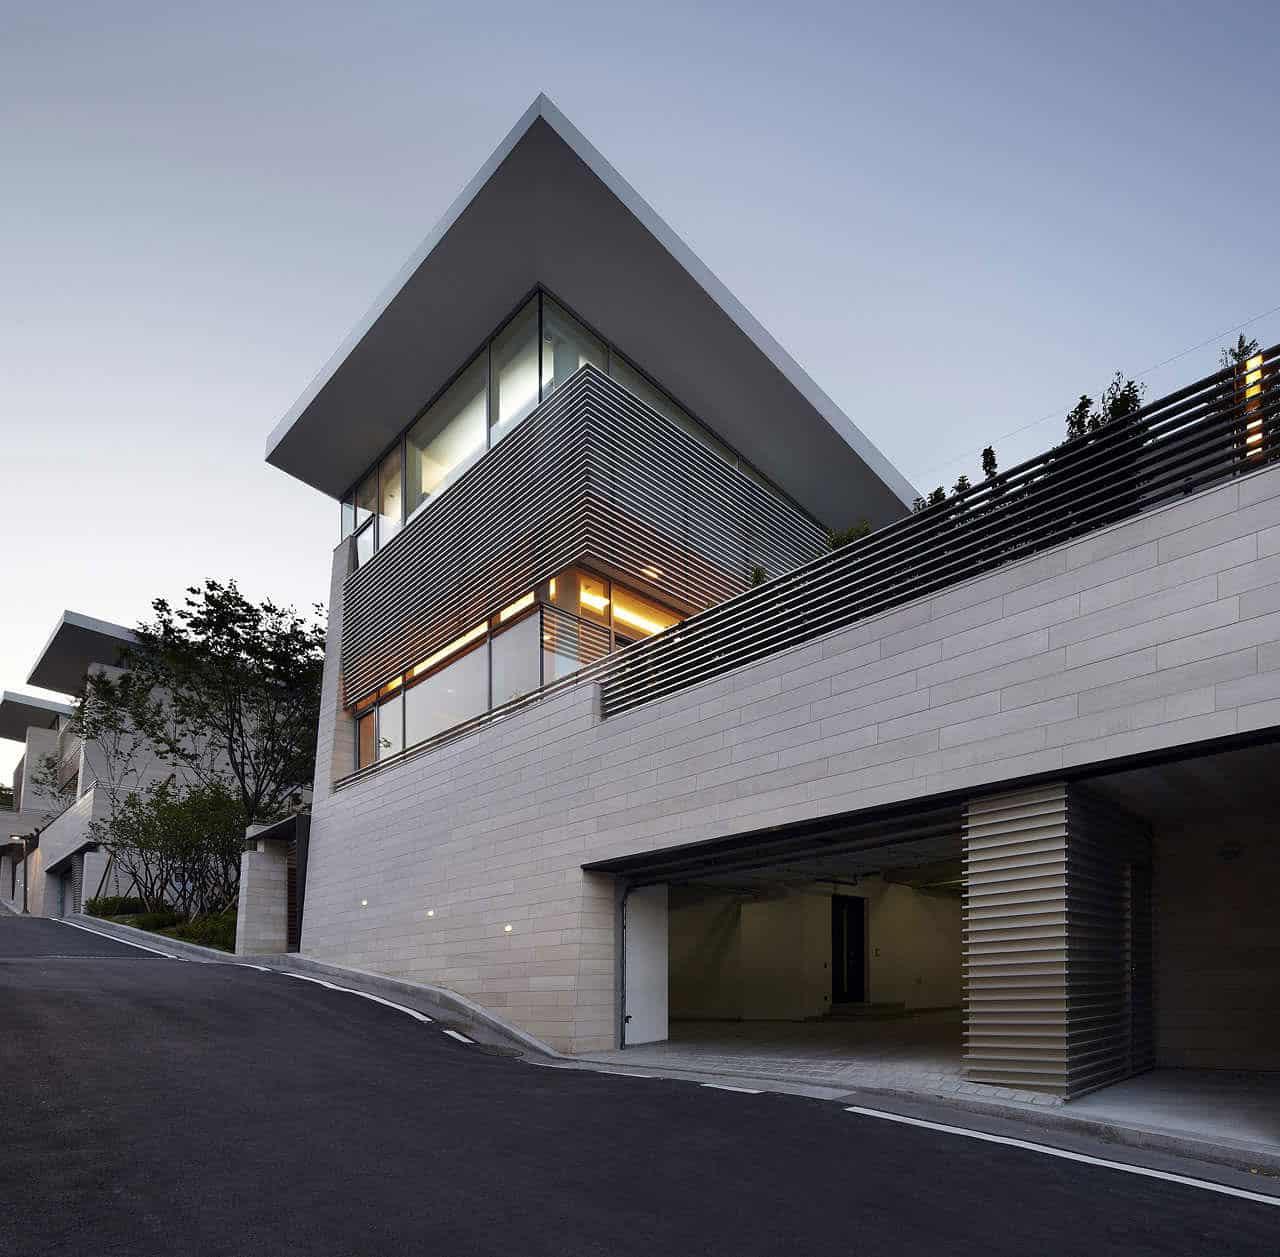 Seongbuk Gate Hills by Joel Sanders and Haeahn (11)